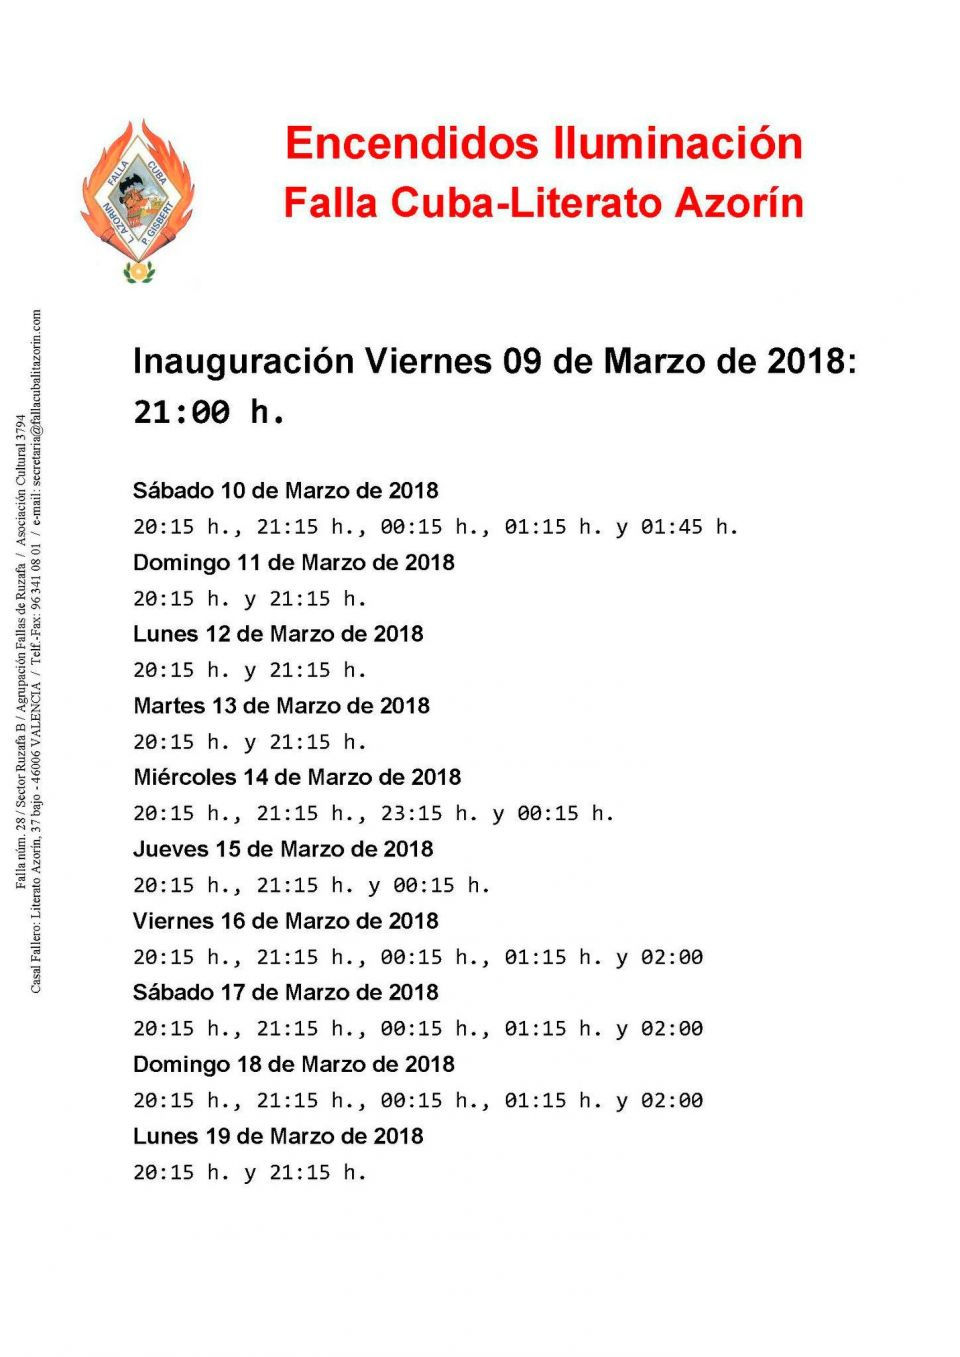 Encendido Luces Falla Cuba 2018